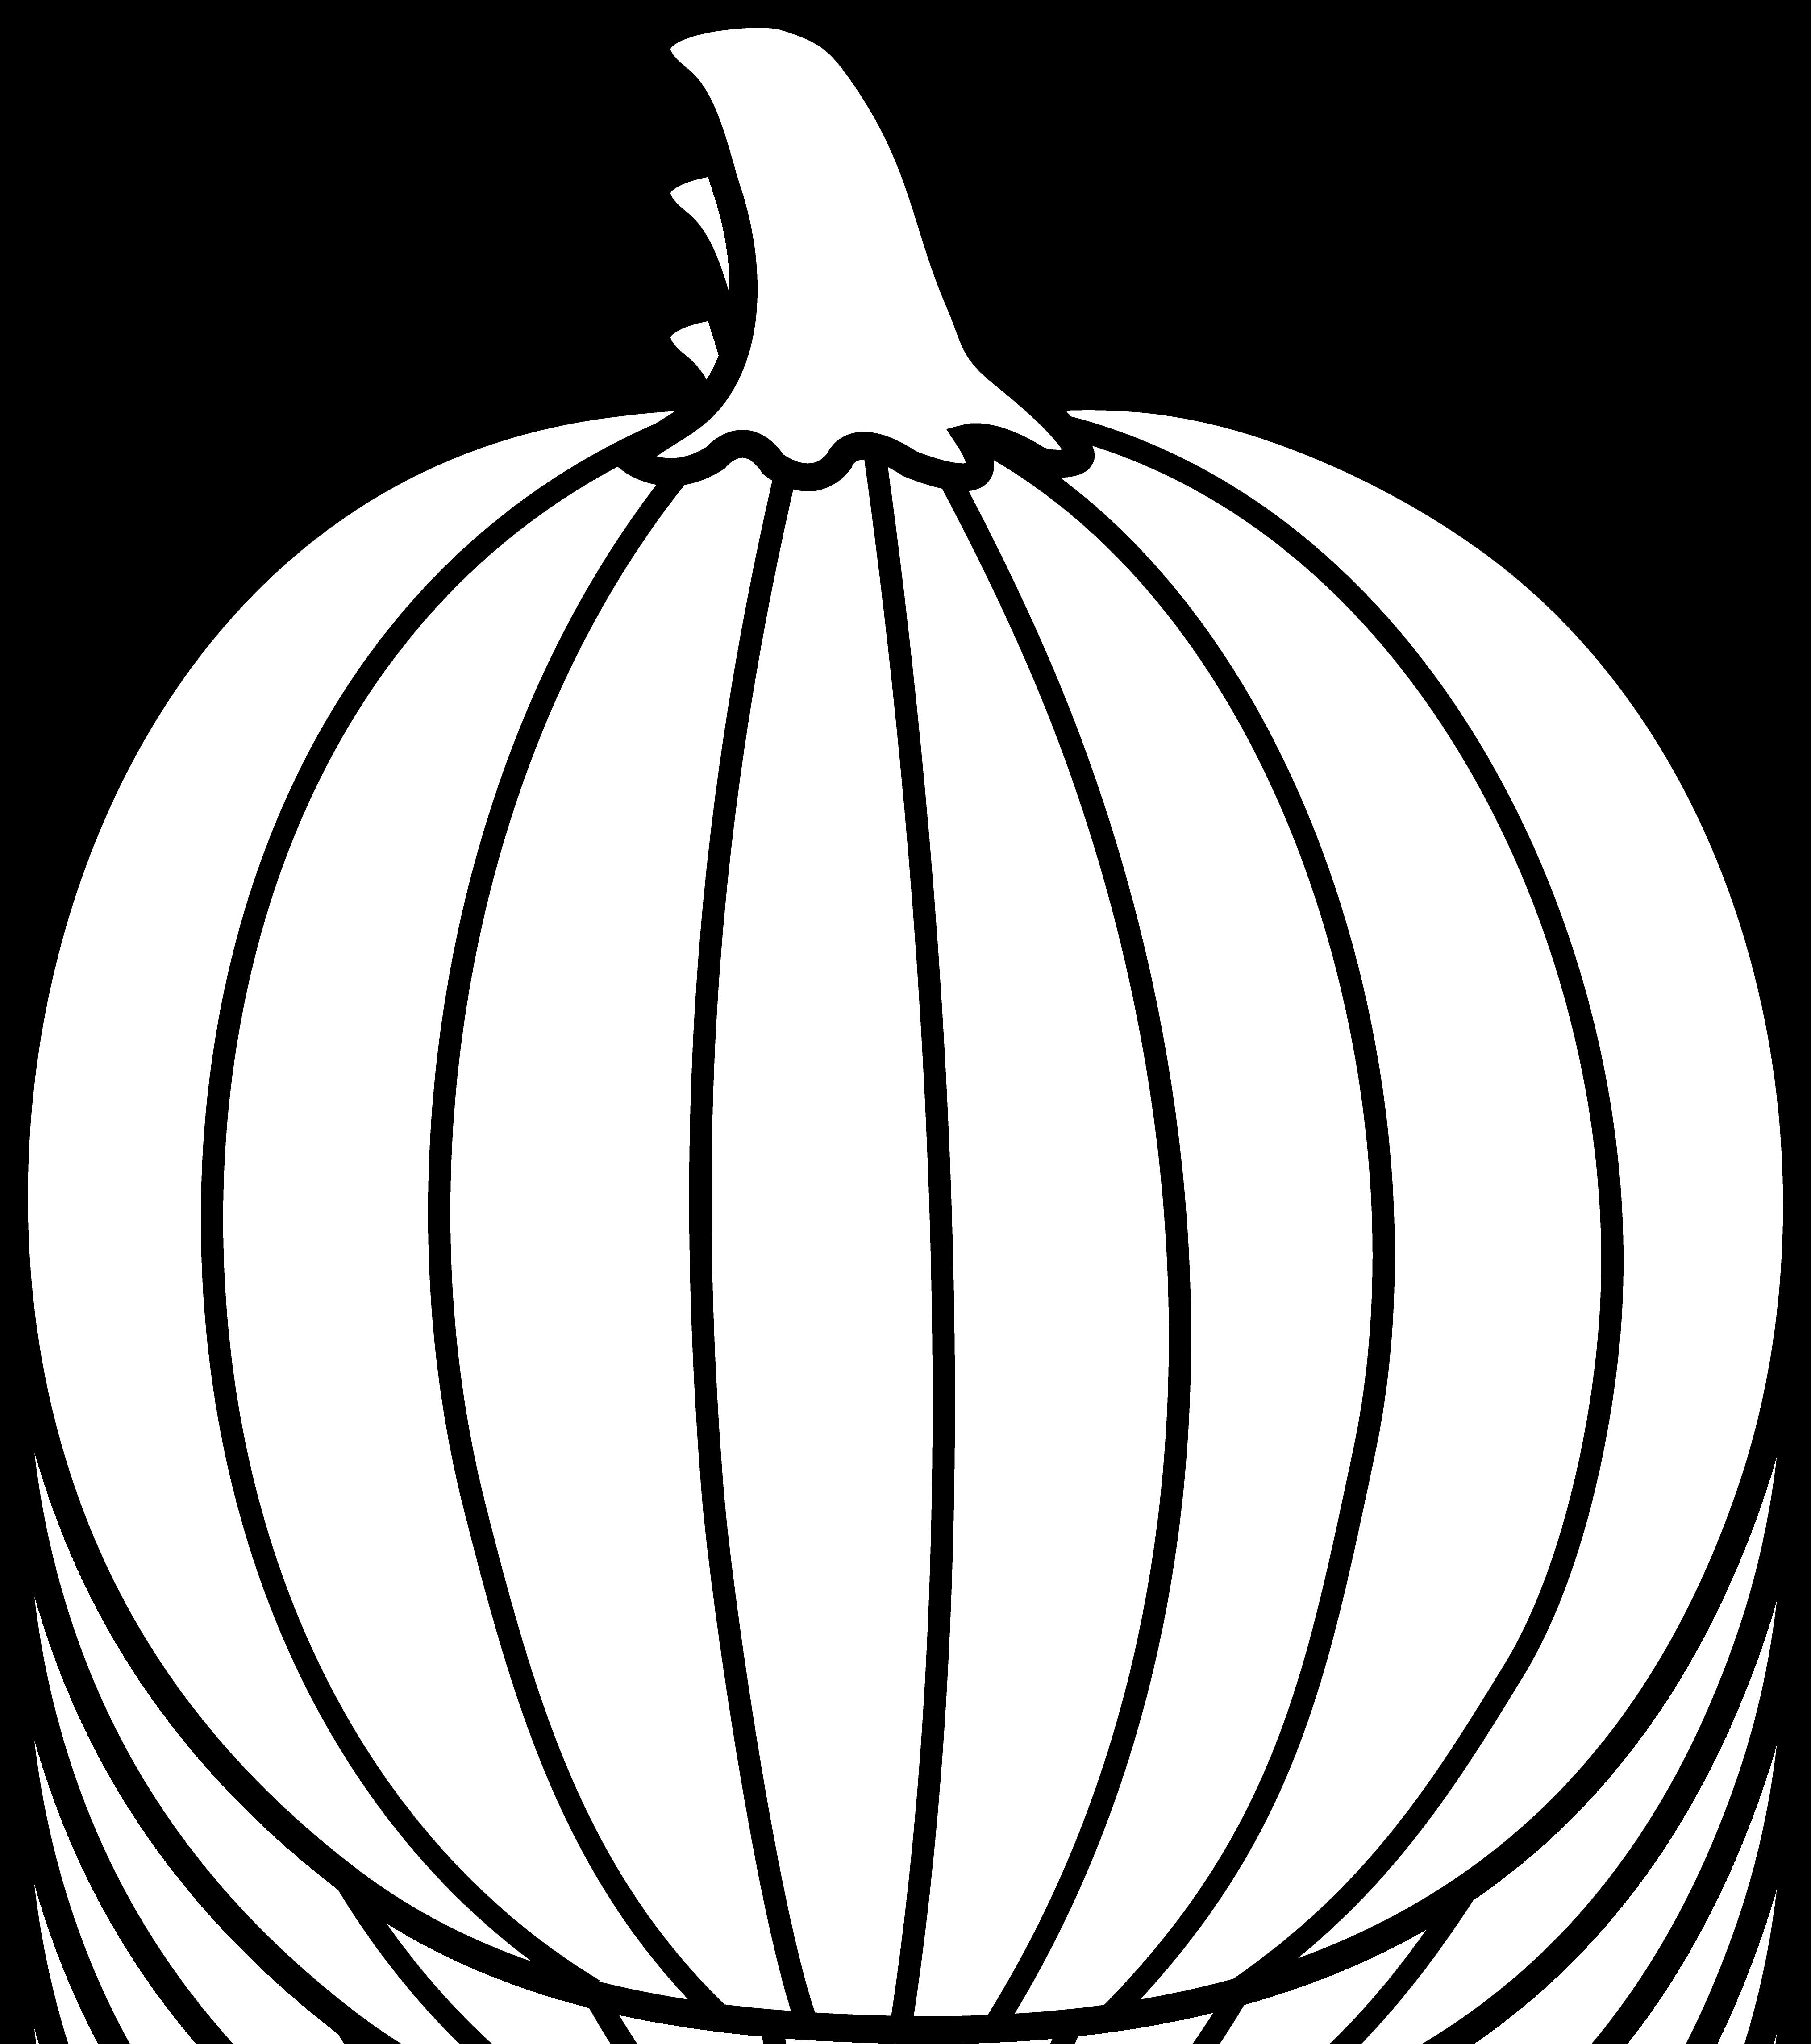 Pumpkin Outline Printable - Clipart Panda  Free Clipart Images